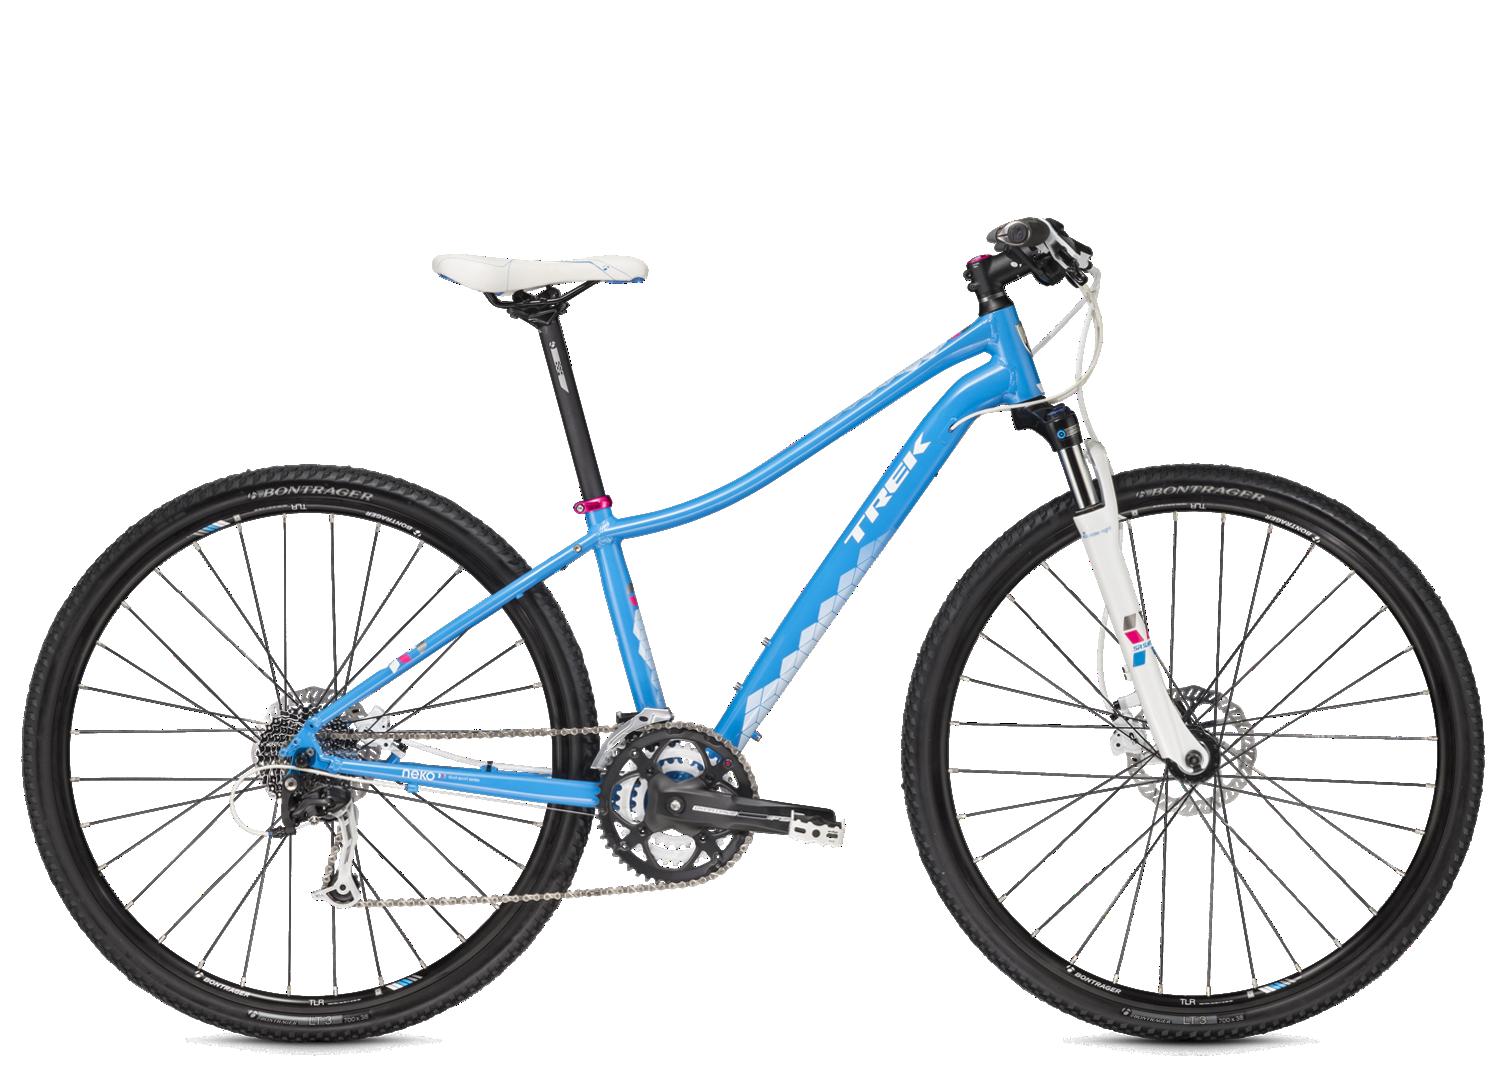 Neko Sl Trek Bicycle